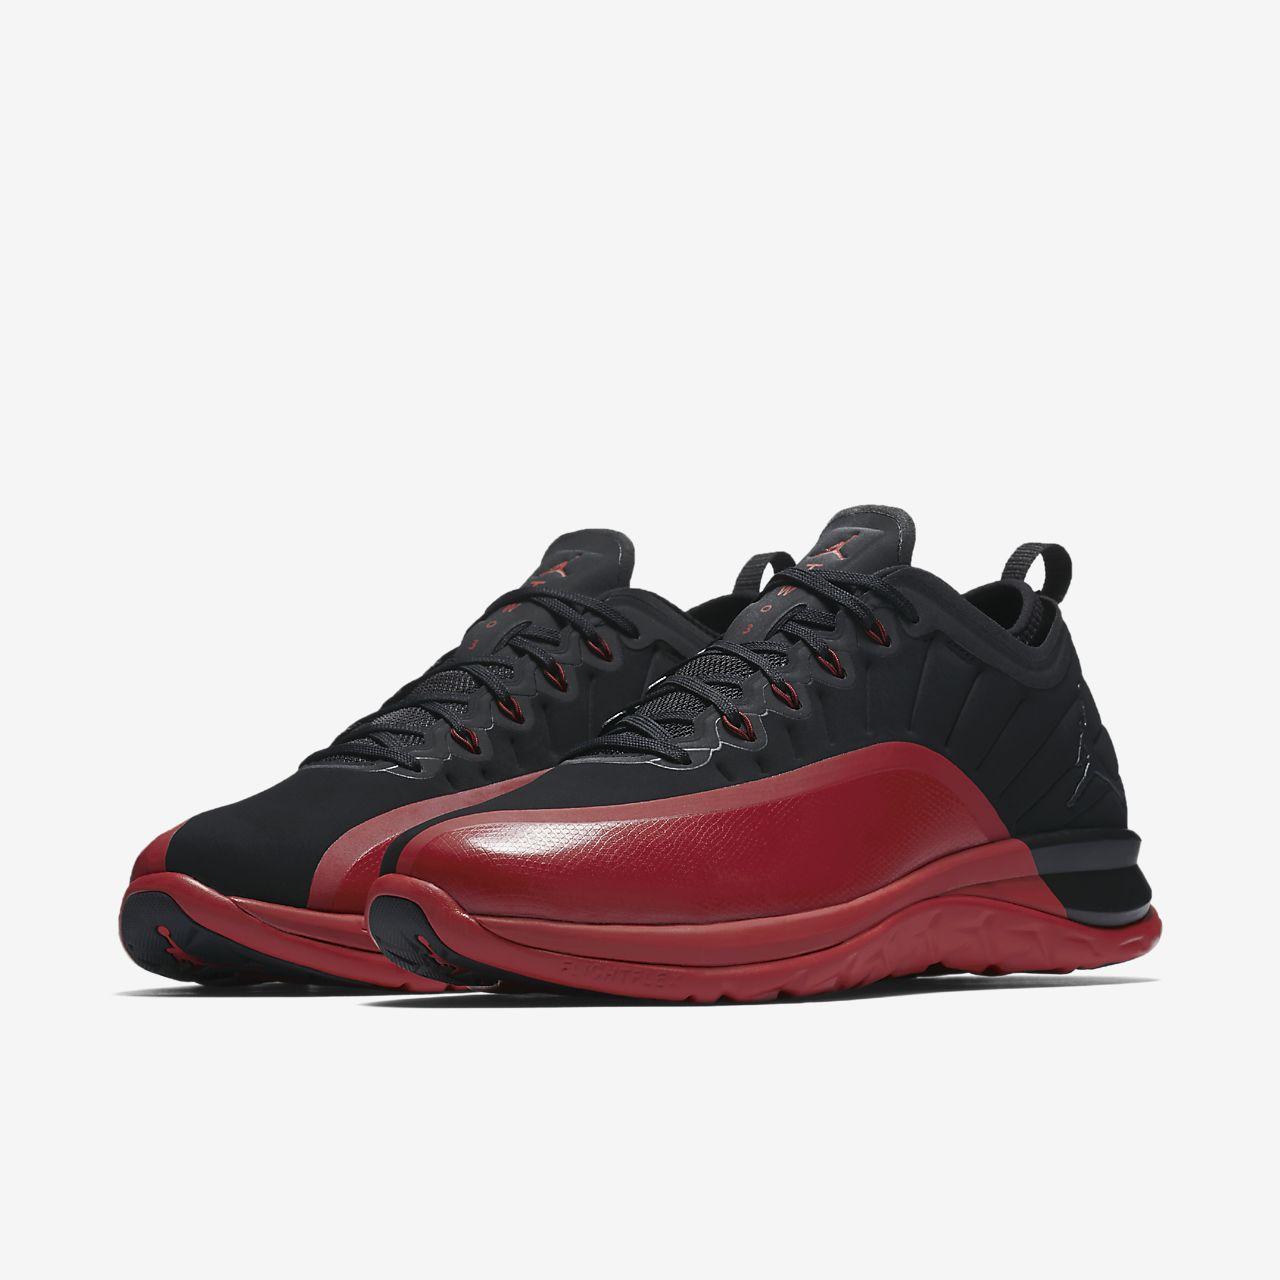 ... Jordan Trainer Prime Men's Training Shoe